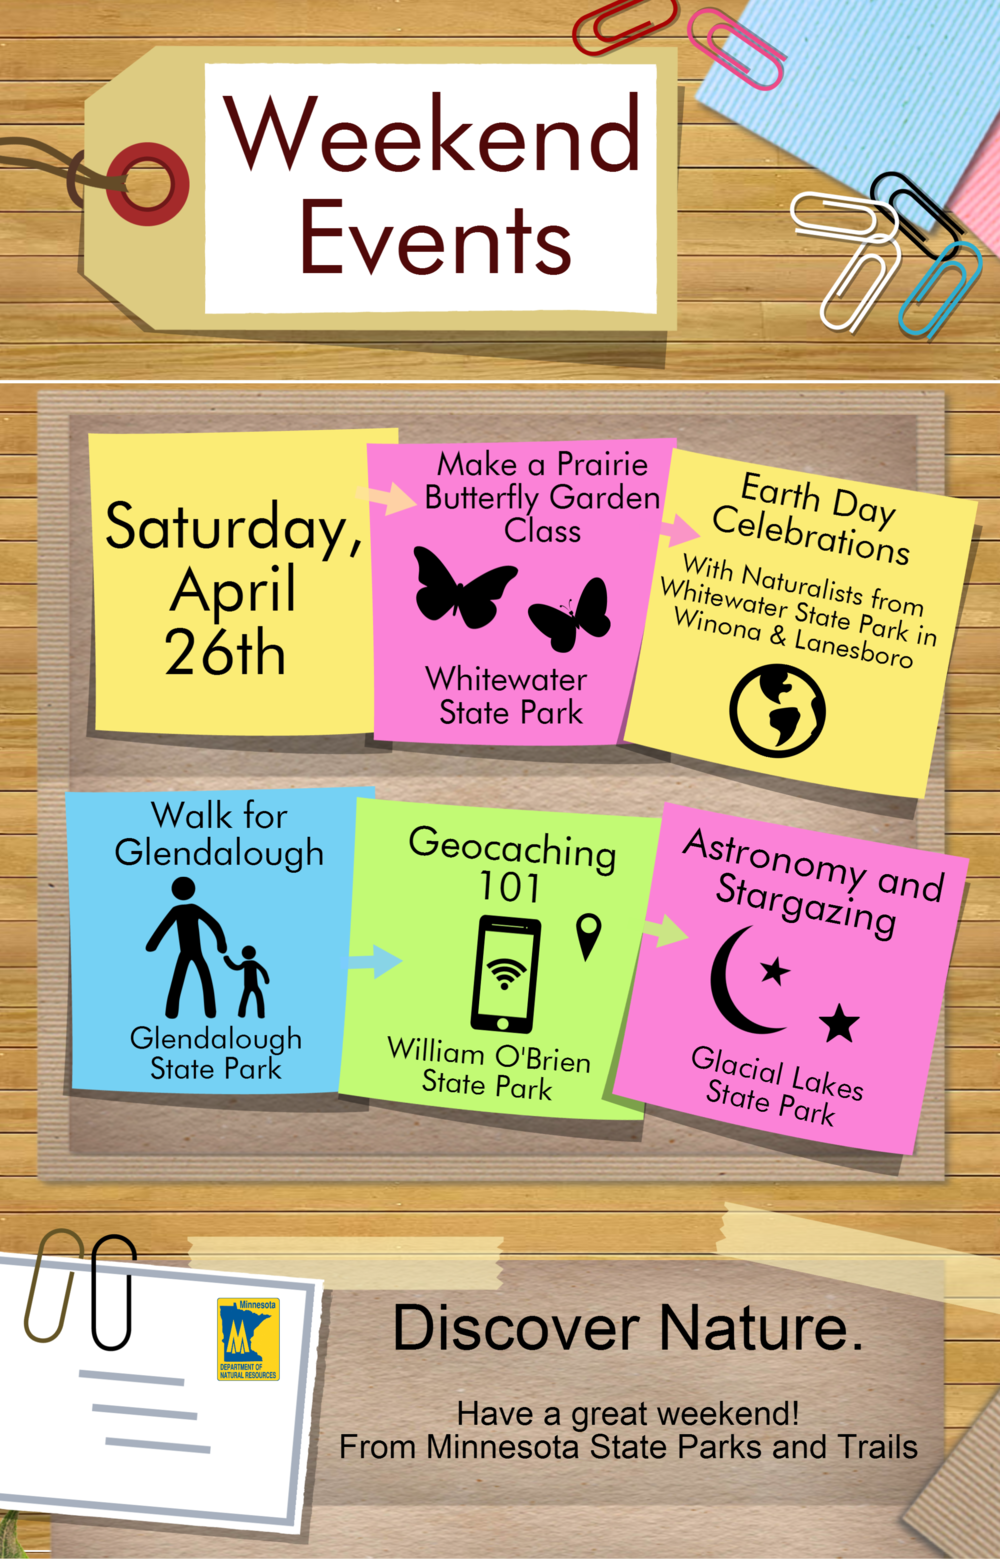 todo_events_april26 (2).png